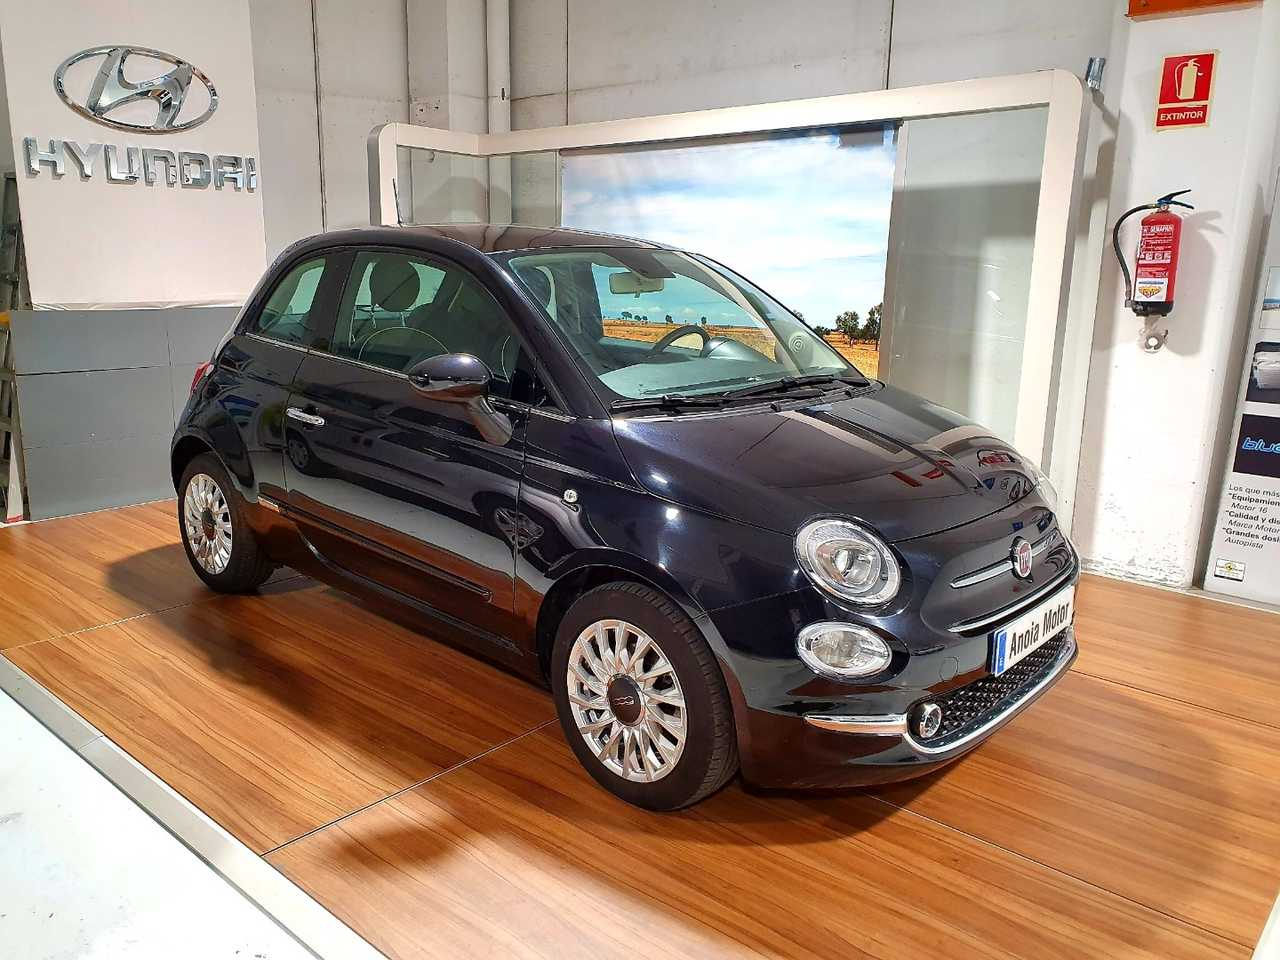 Fiat 500 Lounge 1.2 cc 69 cv Con extras.  - Foto 1